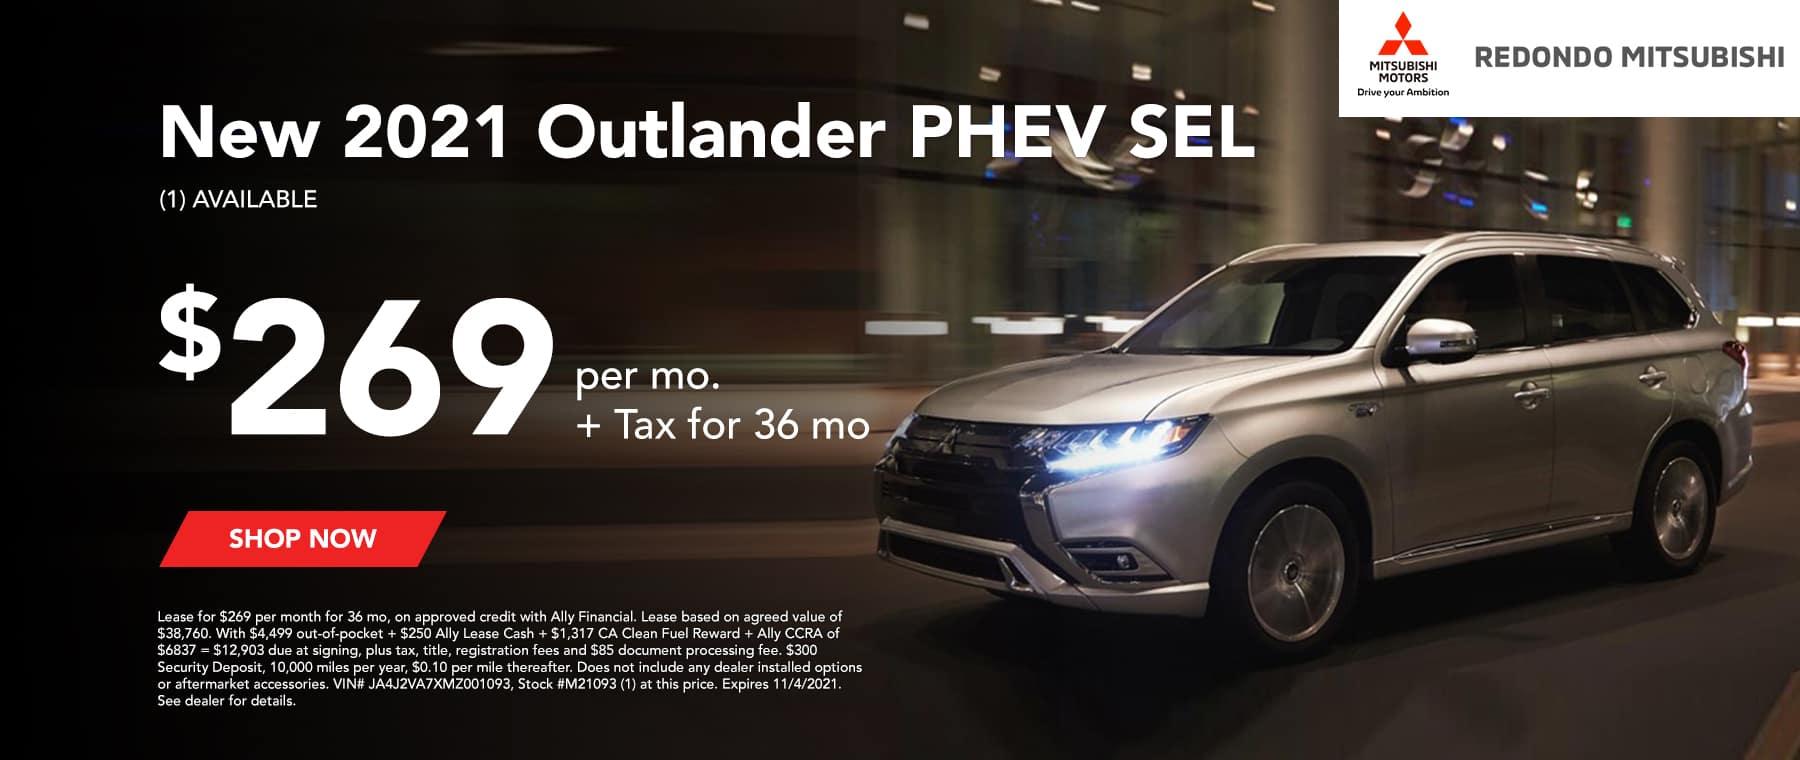 New 2021 OUTLANDER PHEV